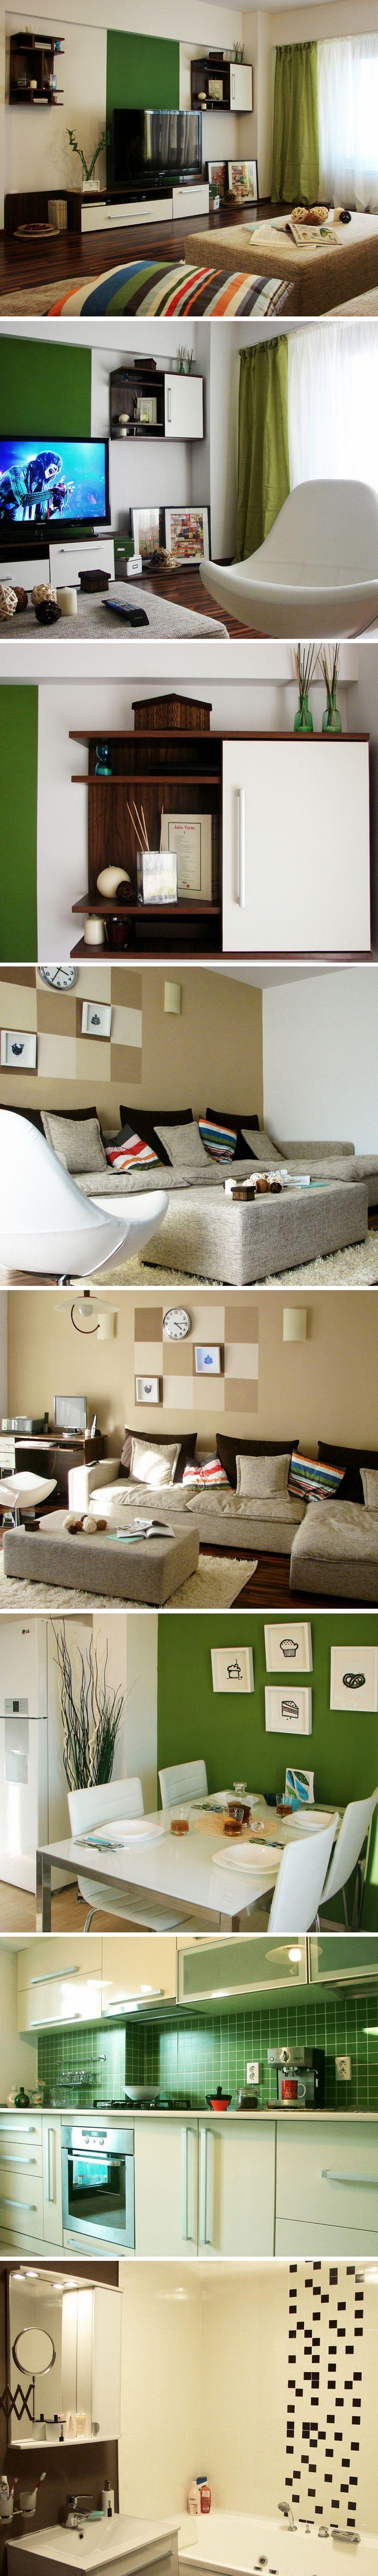 One Room Living Design 17 Best Images About Korean Decor On Pinterest One Room